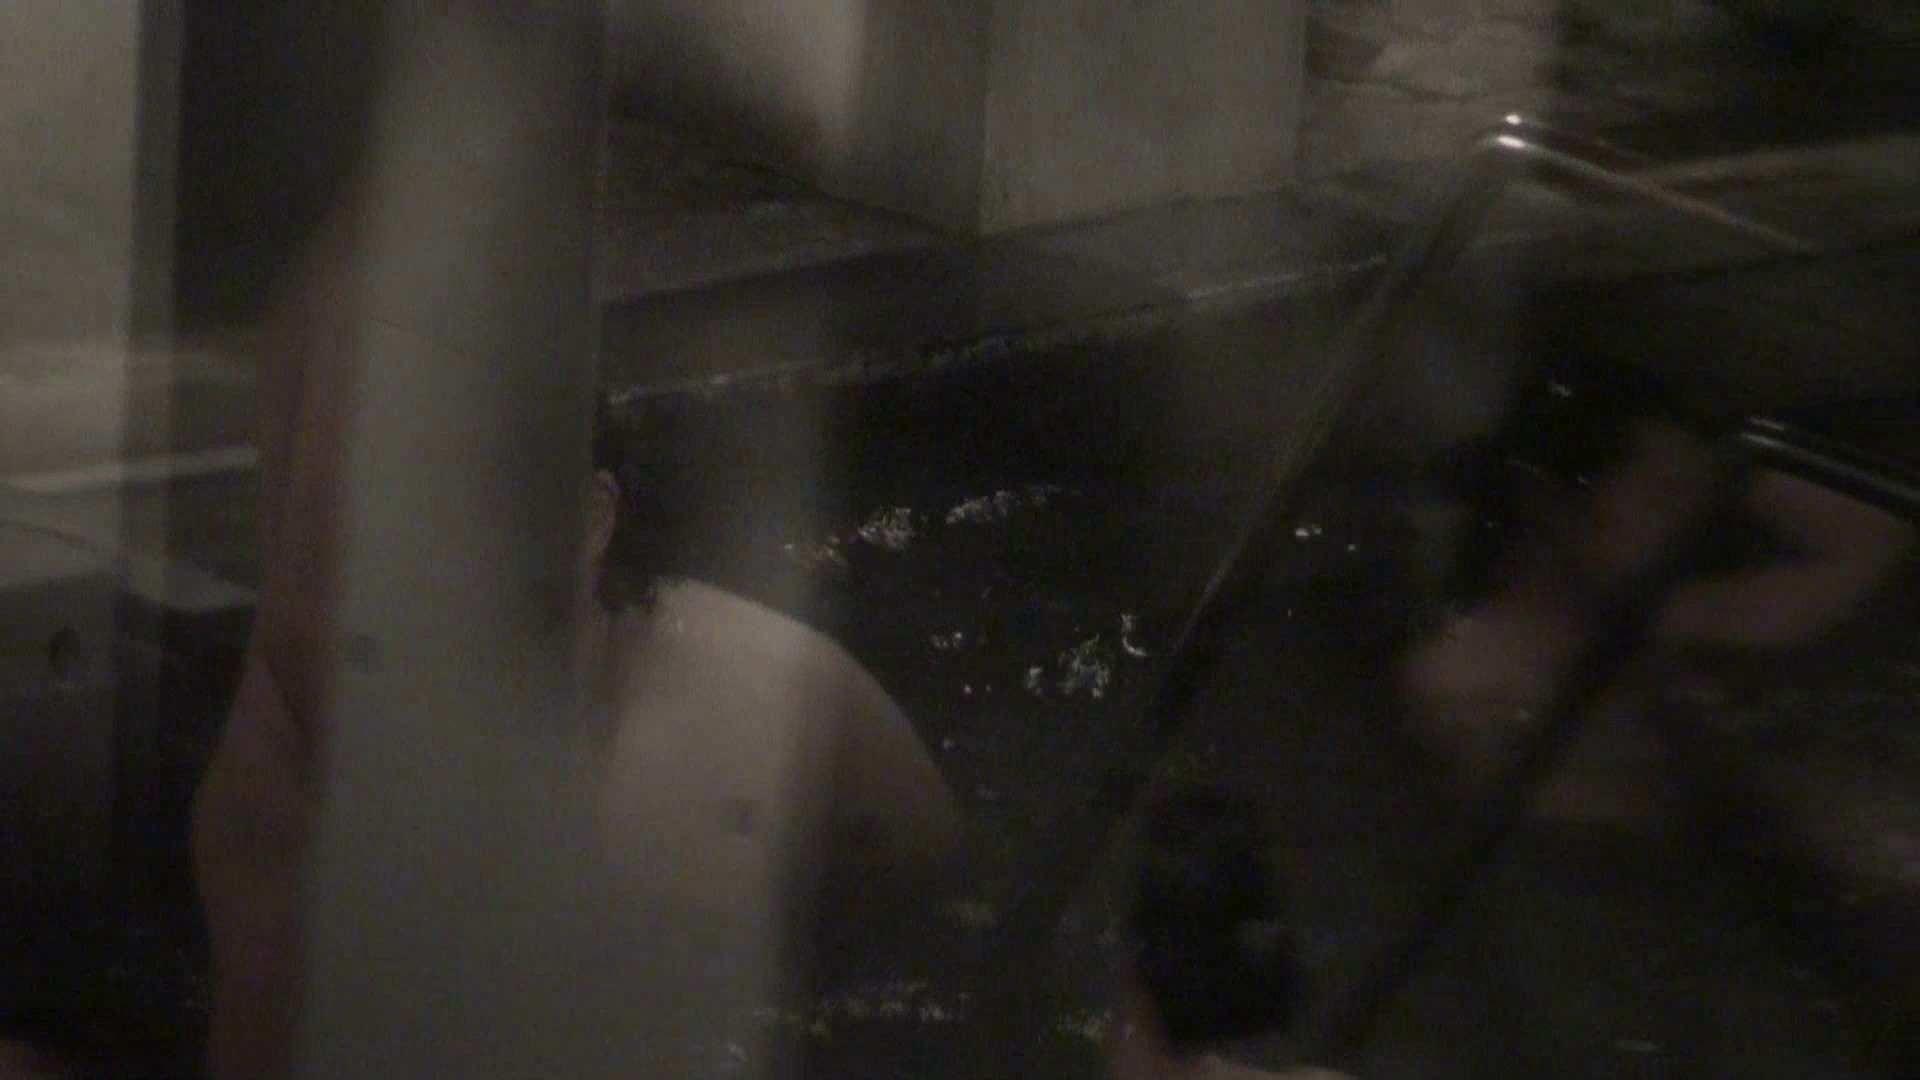 Aquaな露天風呂Vol.388 OLのエロ生活 えろ無修正画像 86連発 53